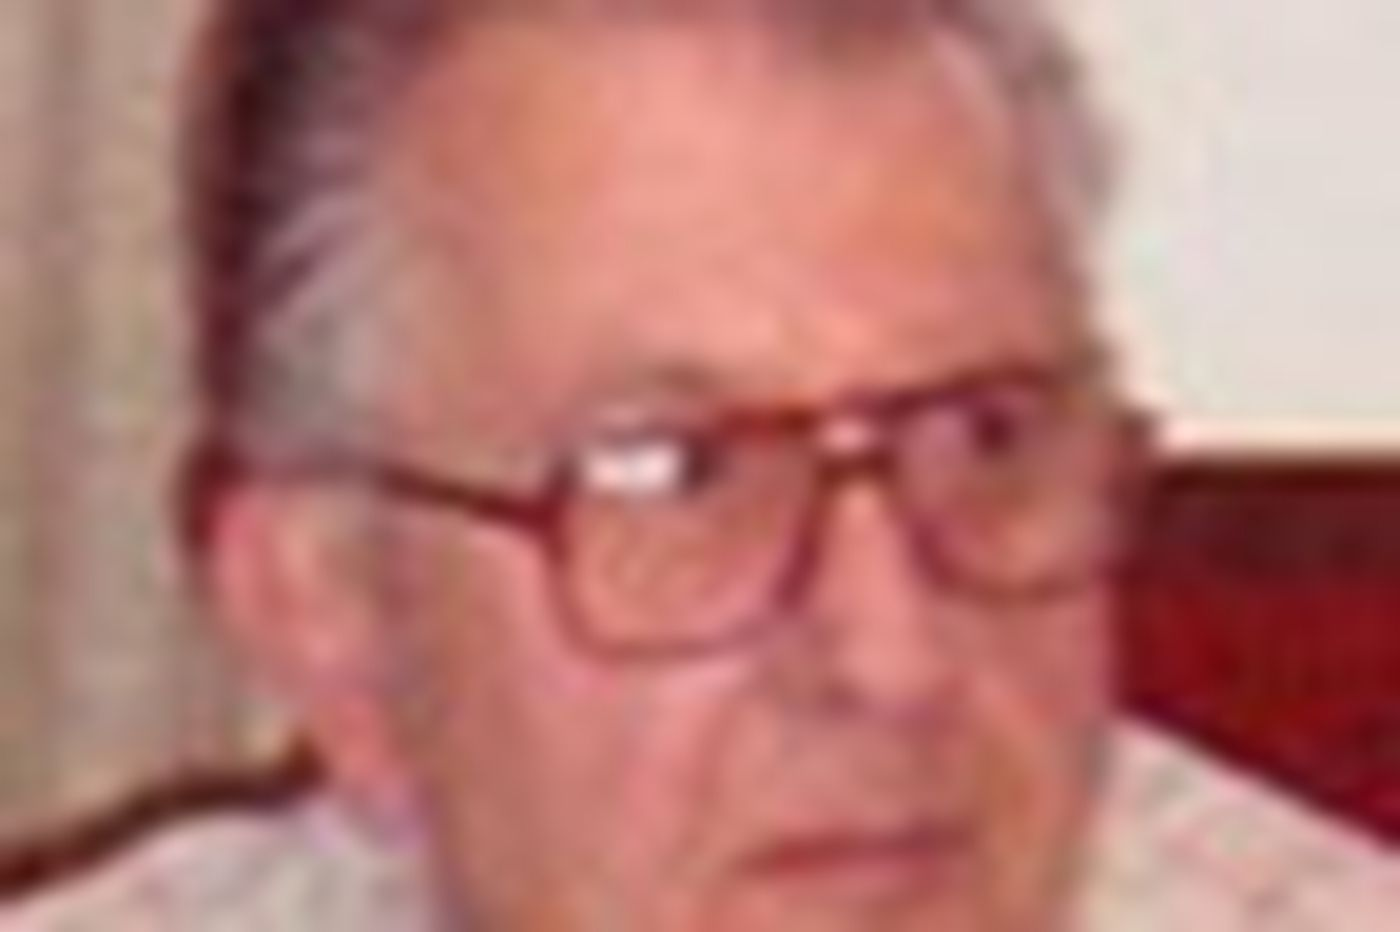 Irving Millman, microbiologist